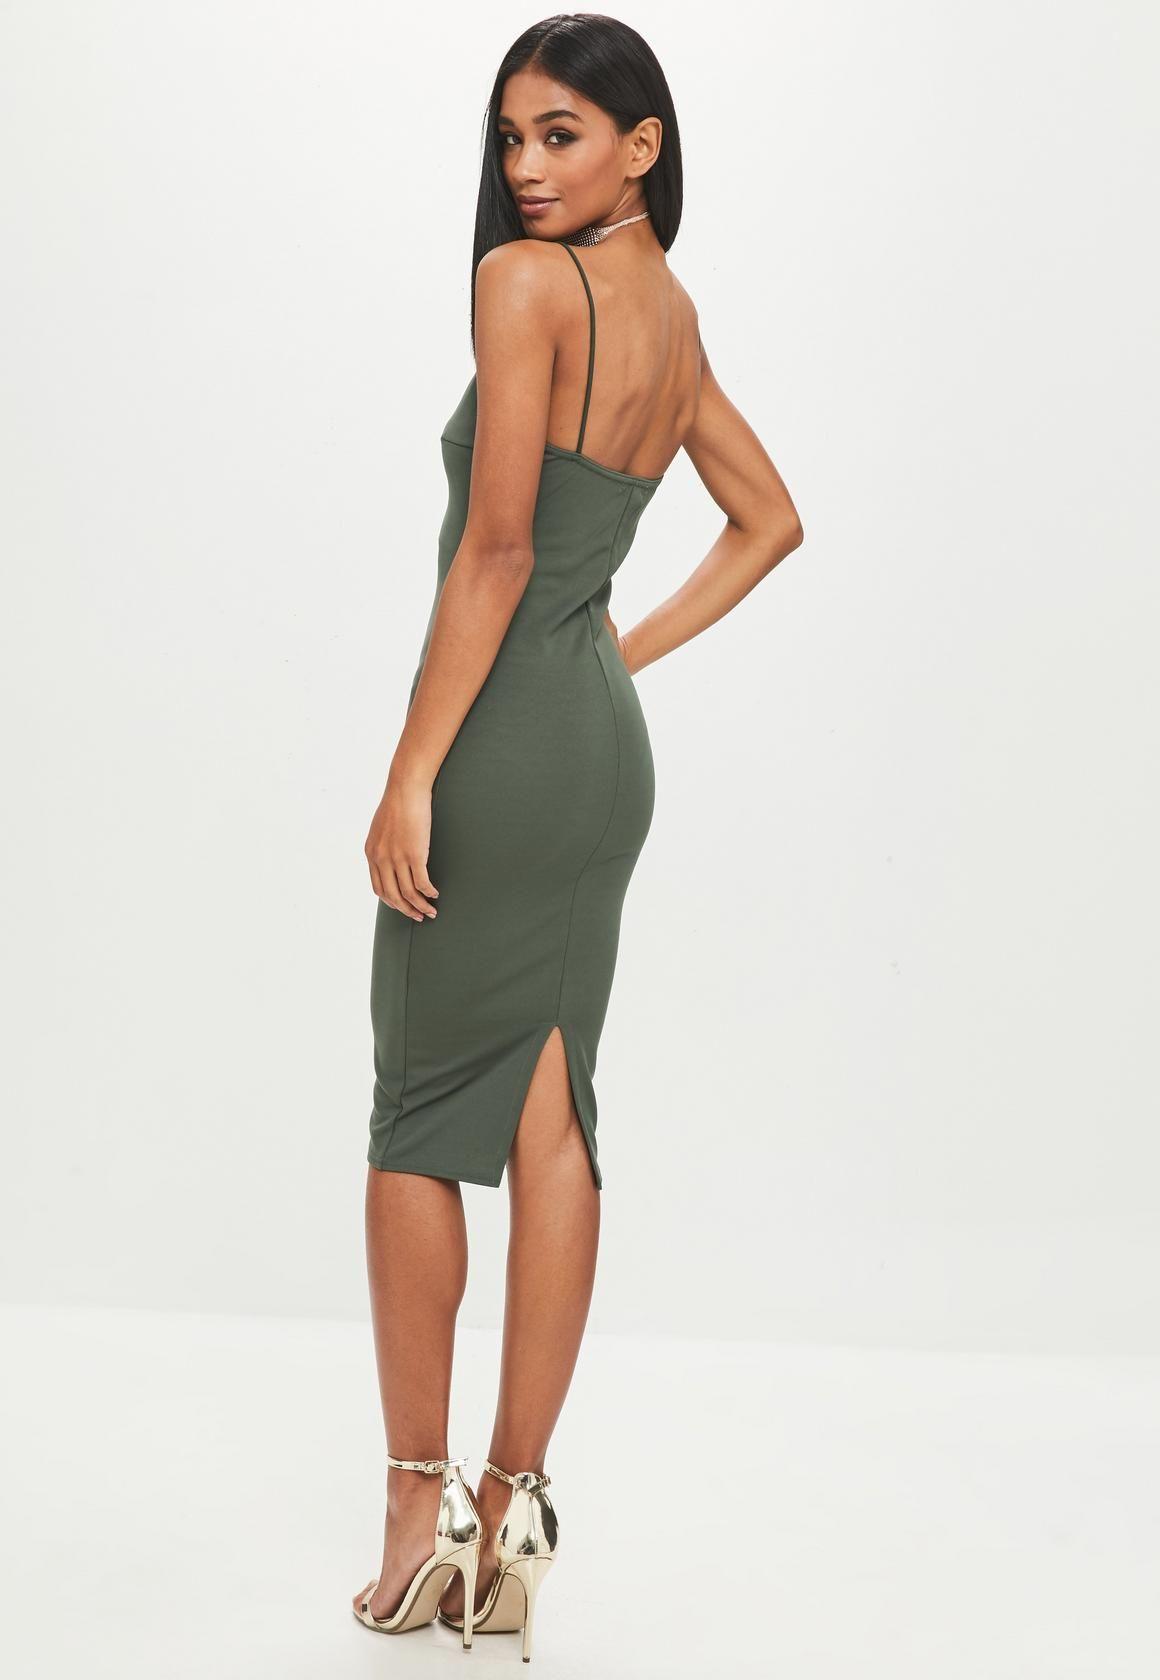 Missguided Khaki Strappy Midi Dress Women Dress Online Strappy Midi Dress Womens Dresses [ 1680 x 1160 Pixel ]